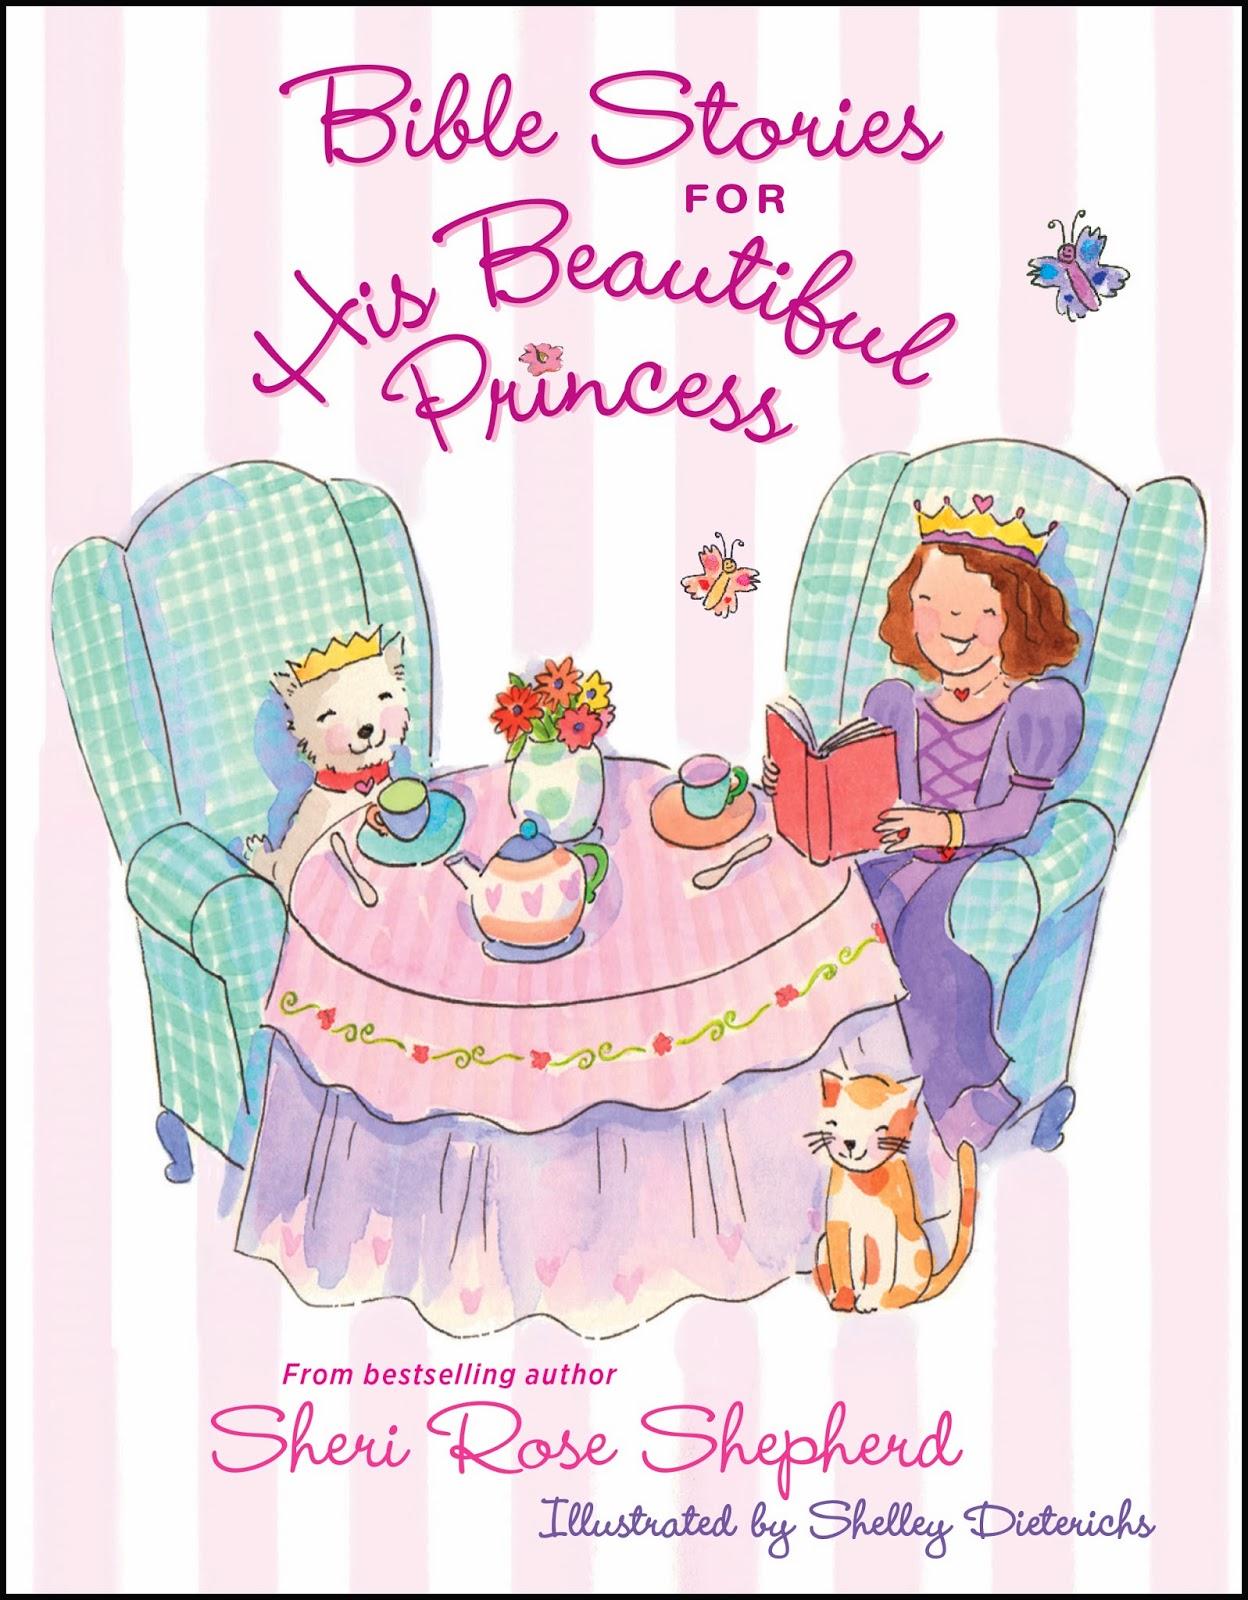 bible stories for his beautiful princess by sheri rose shepherd